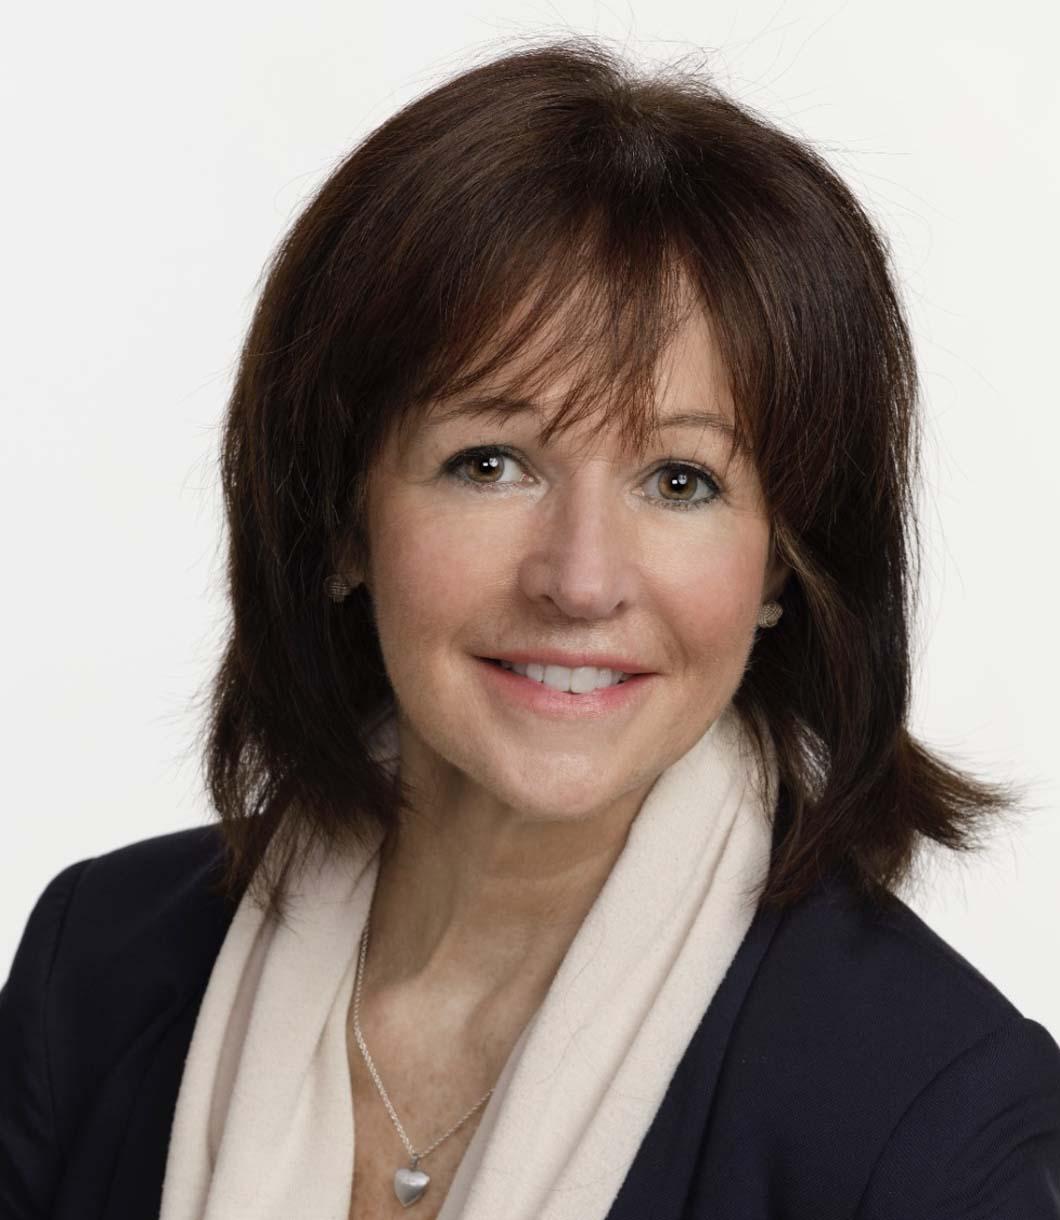 Cheryl Barta - Agent at The Reyna Group